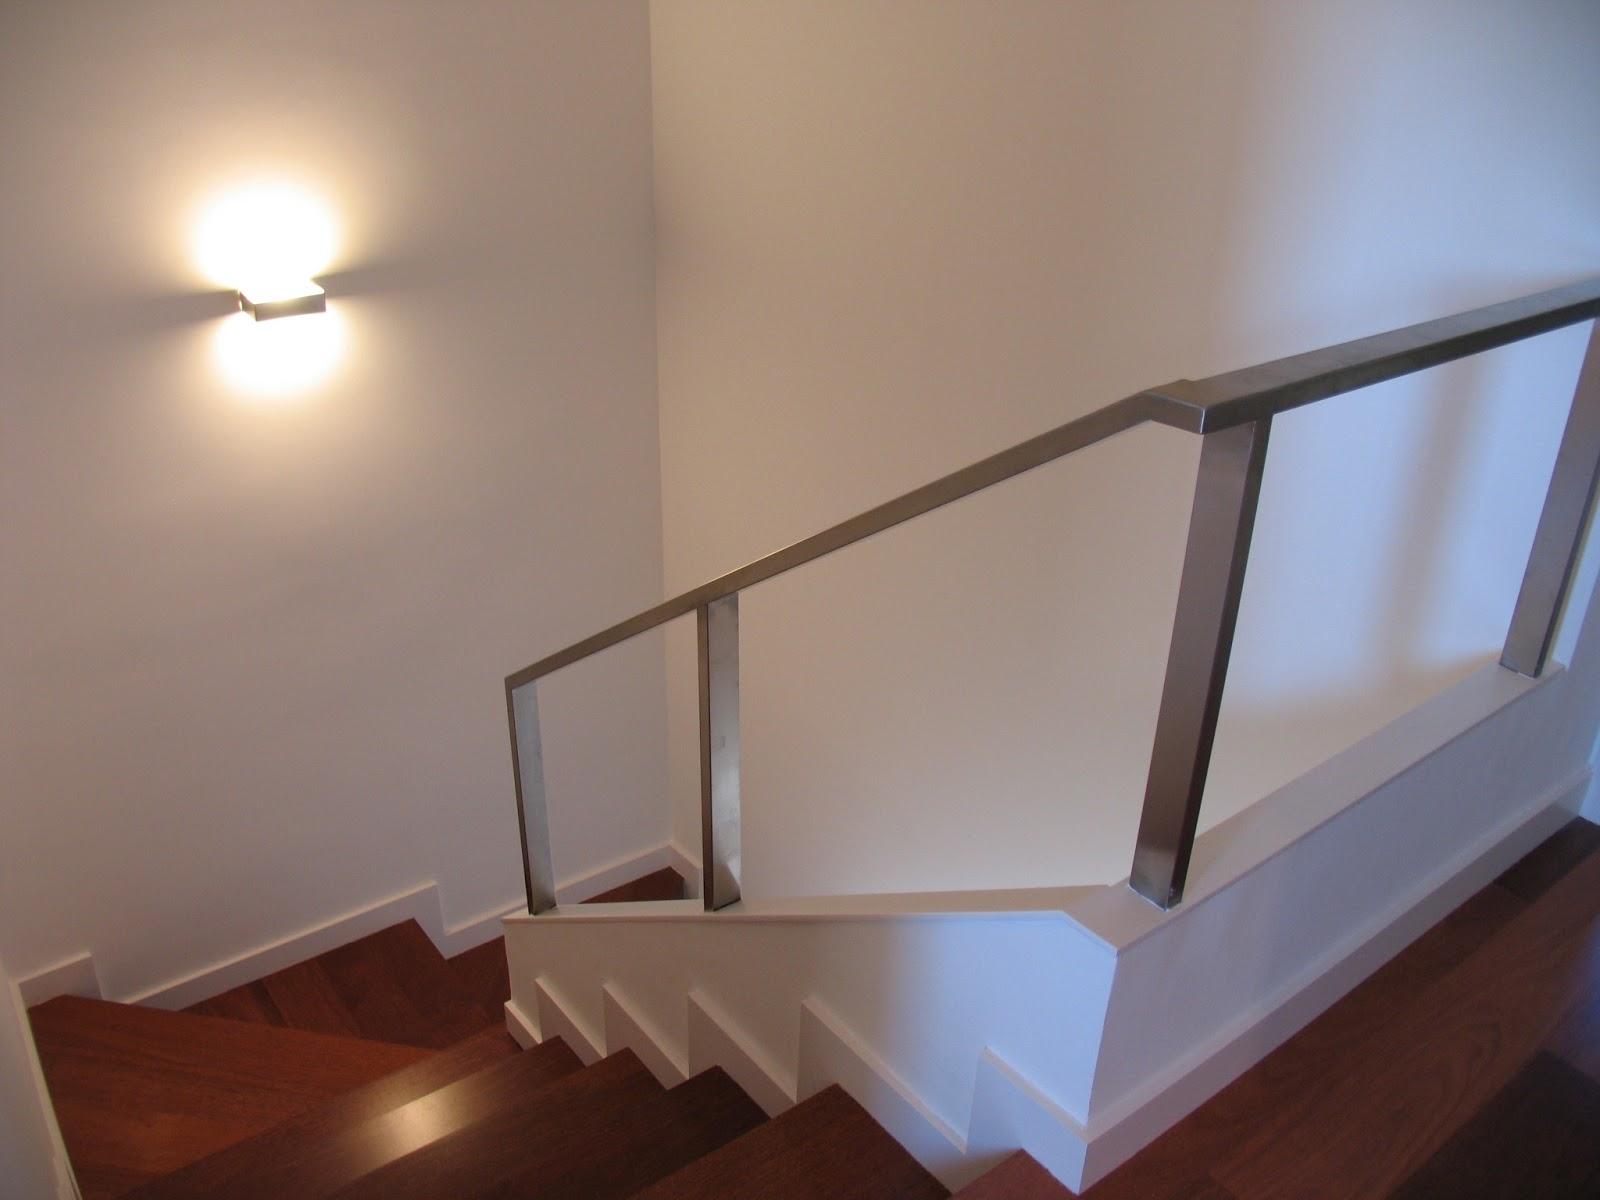 Atrebte pujol iluminaci n a ade a su familia apolo el aplique con led - Iluminacion led escaleras ...